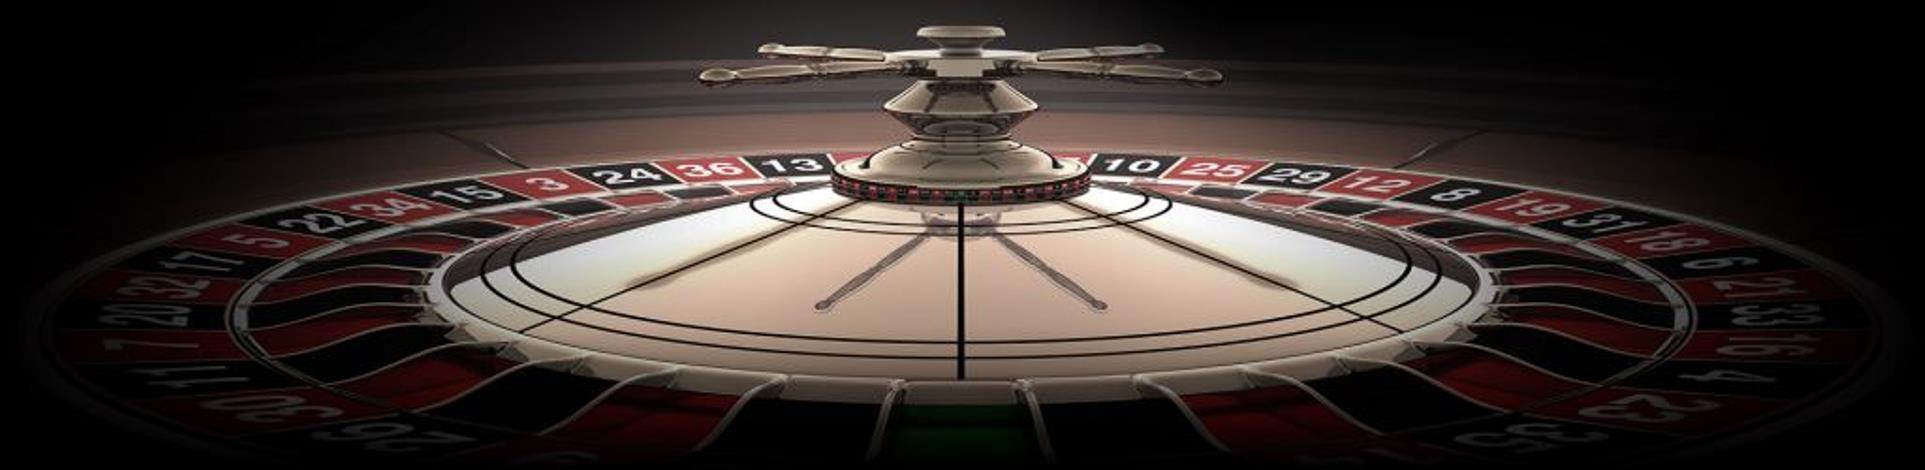 Online Roulette Casino Tops Online - Casino en ligne